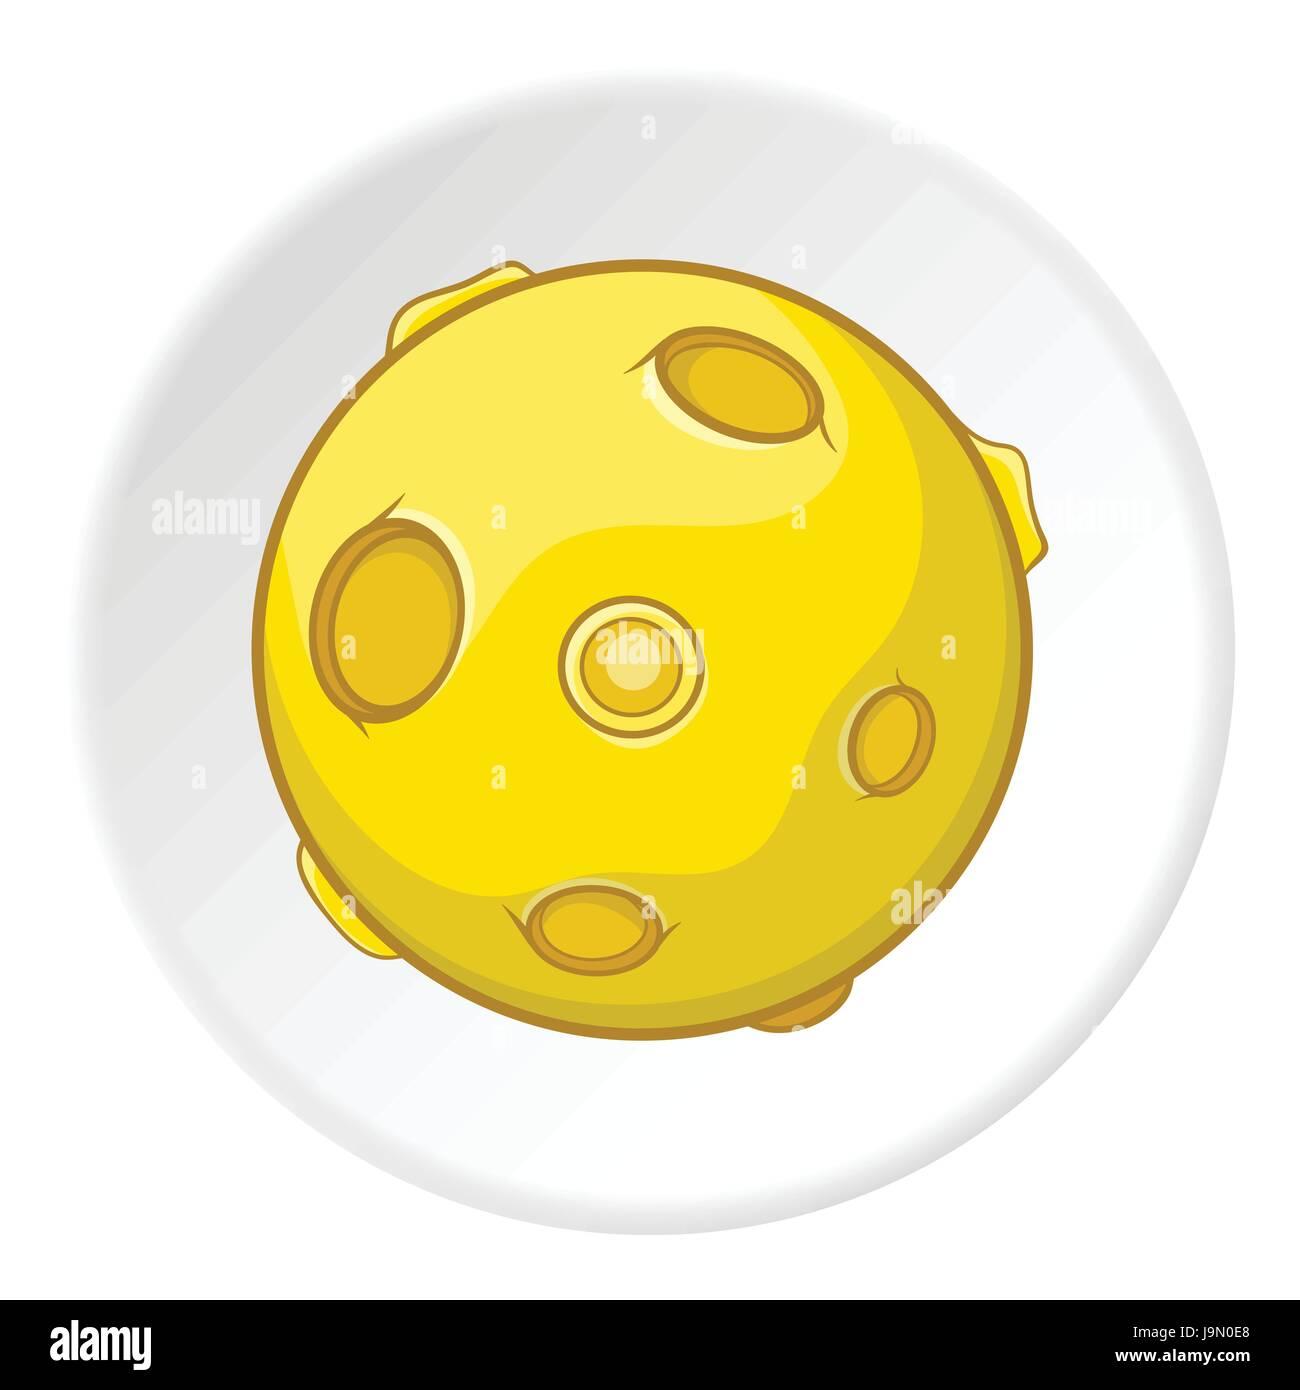 Moon icon, cartoon style - Stock Image